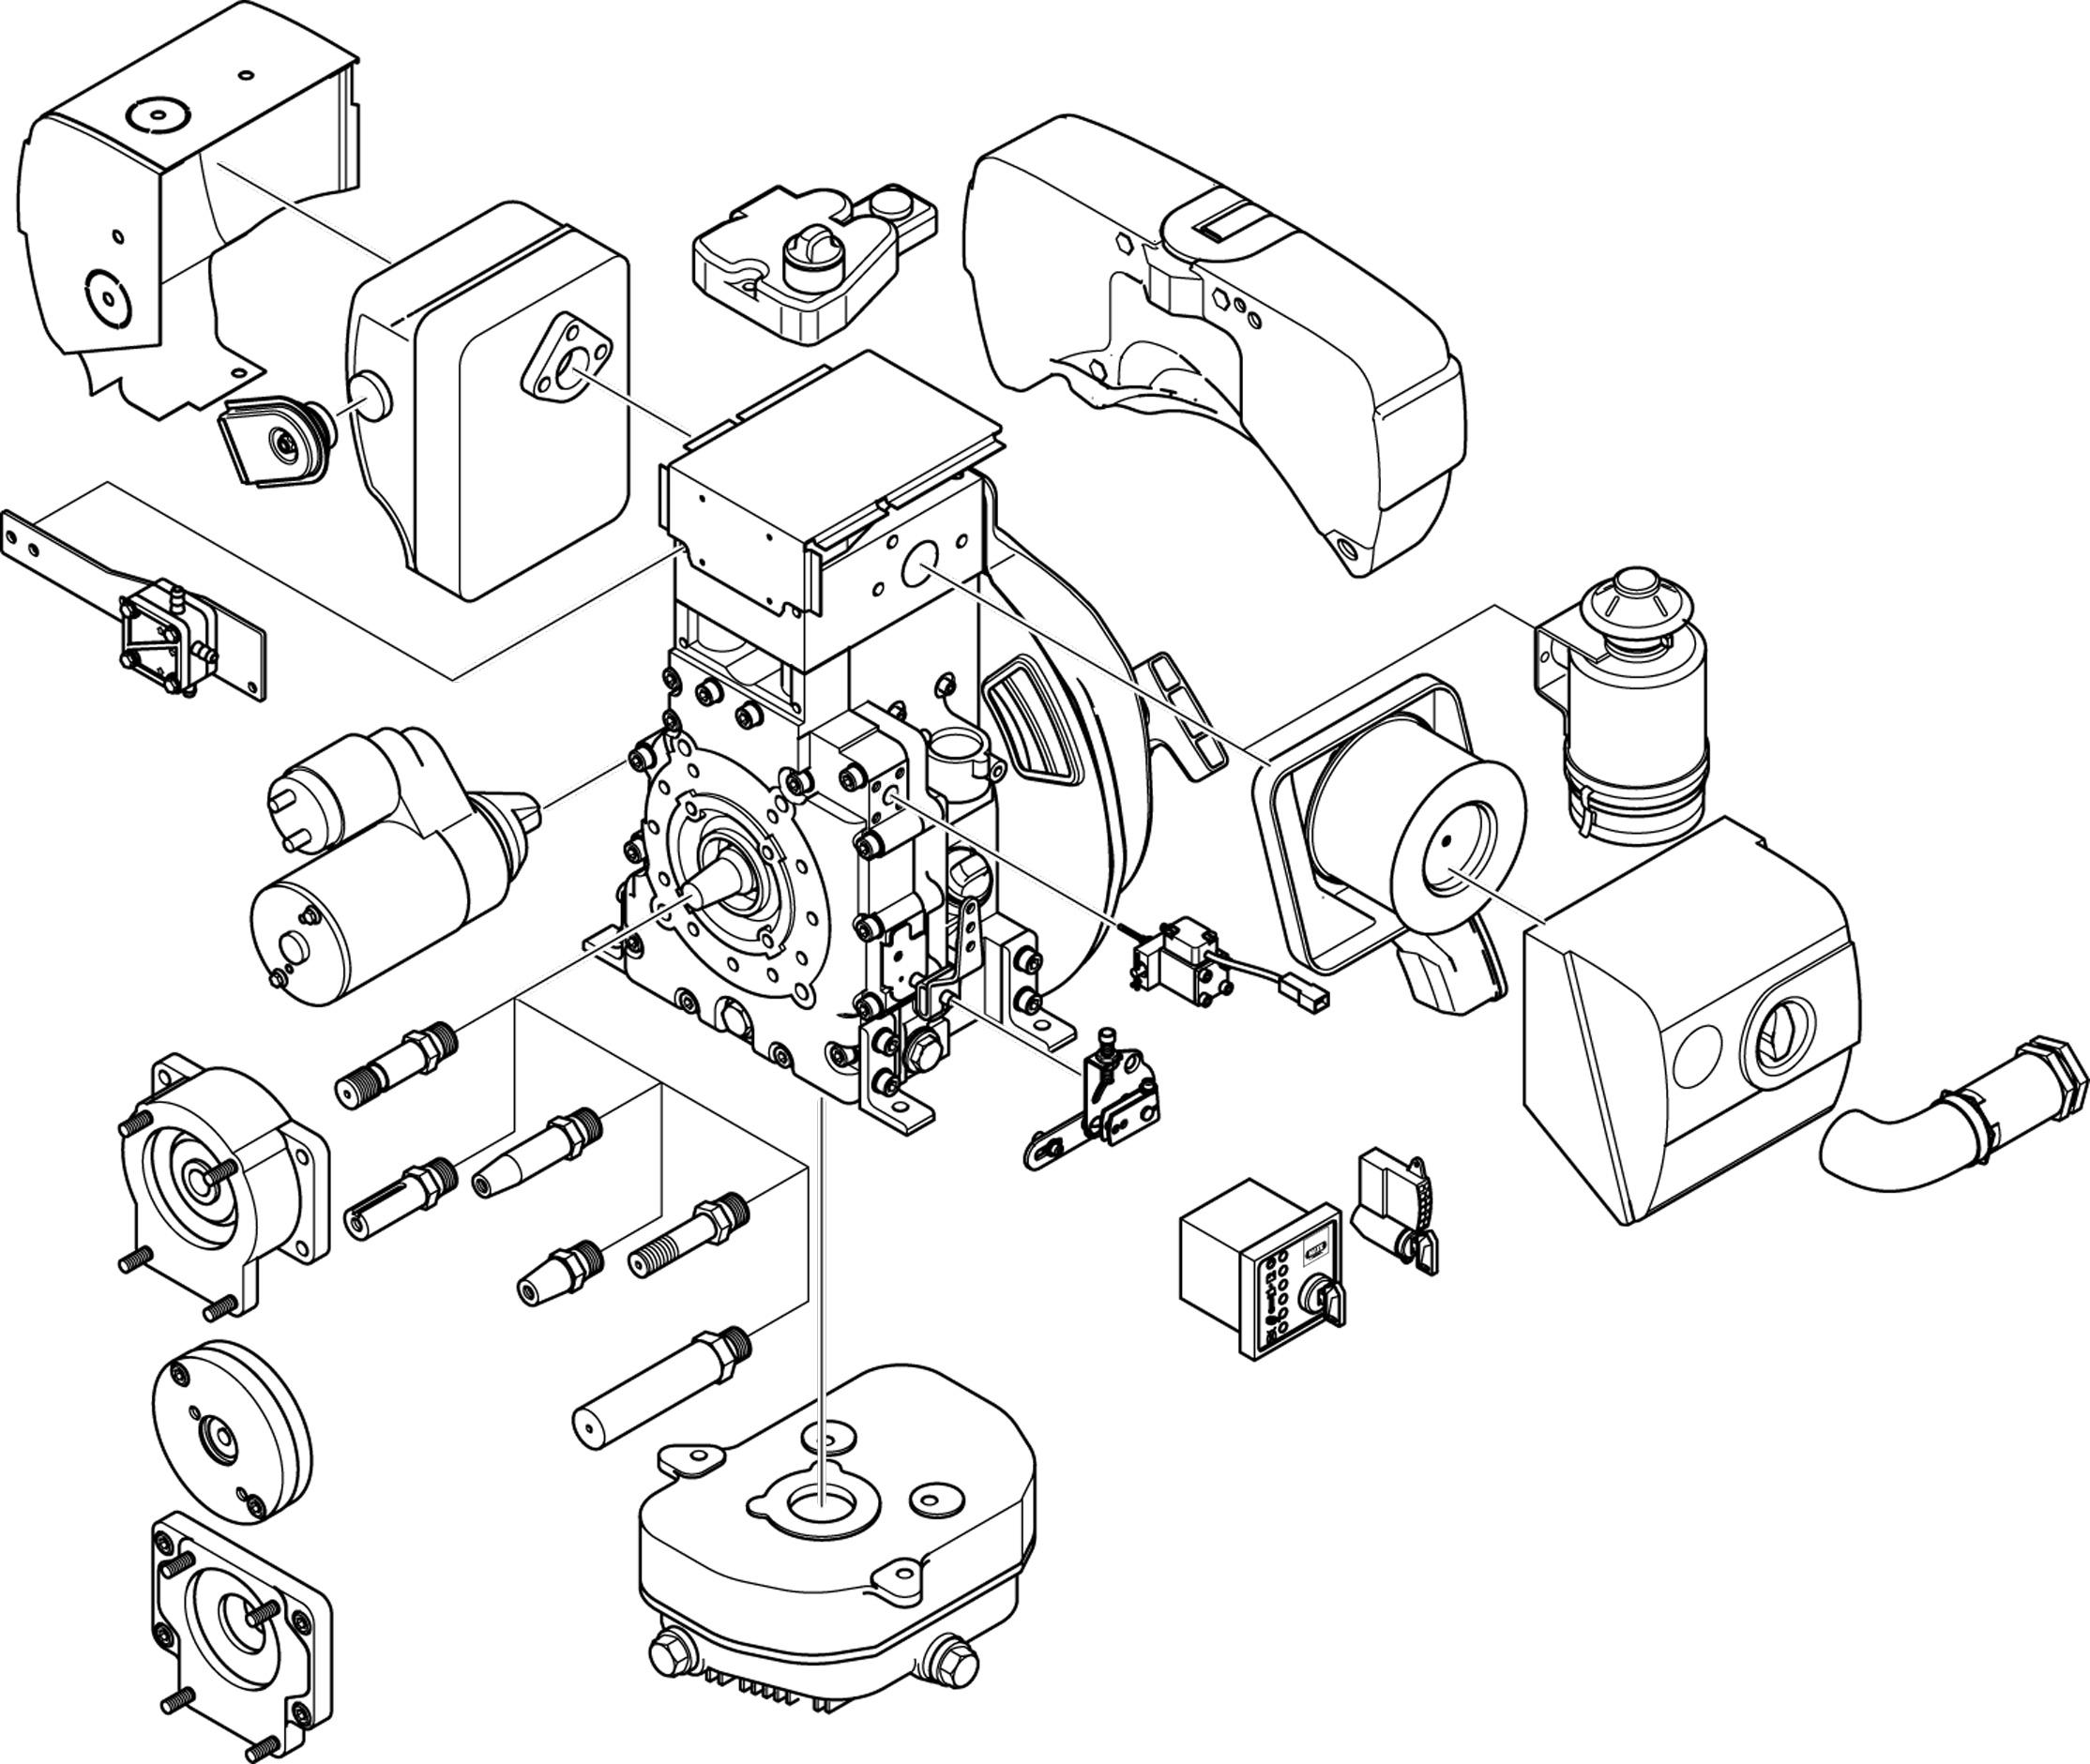 2228x1881 B Series, Small Diesel Engine, Single Cylinder Engine